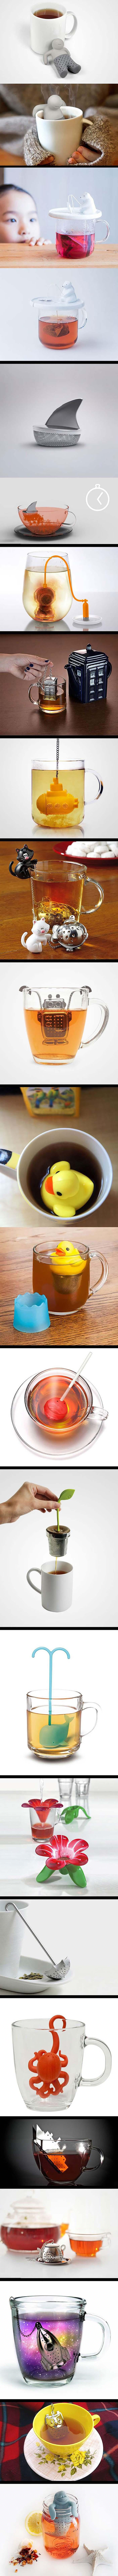 Creative Tea Infusers For Tea Lovers